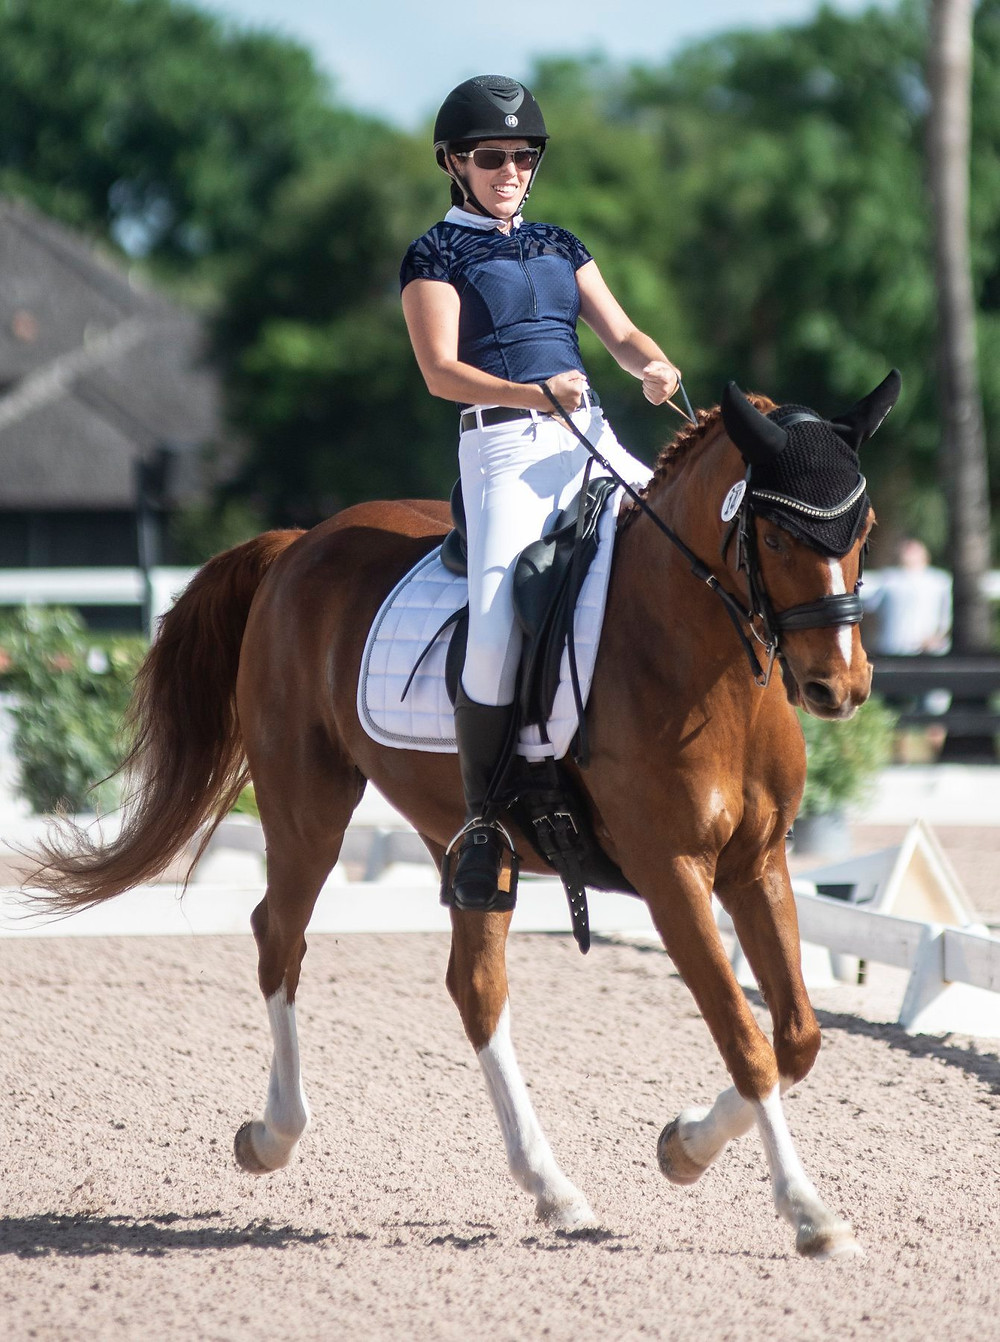 ParaEquestrian dressage horse